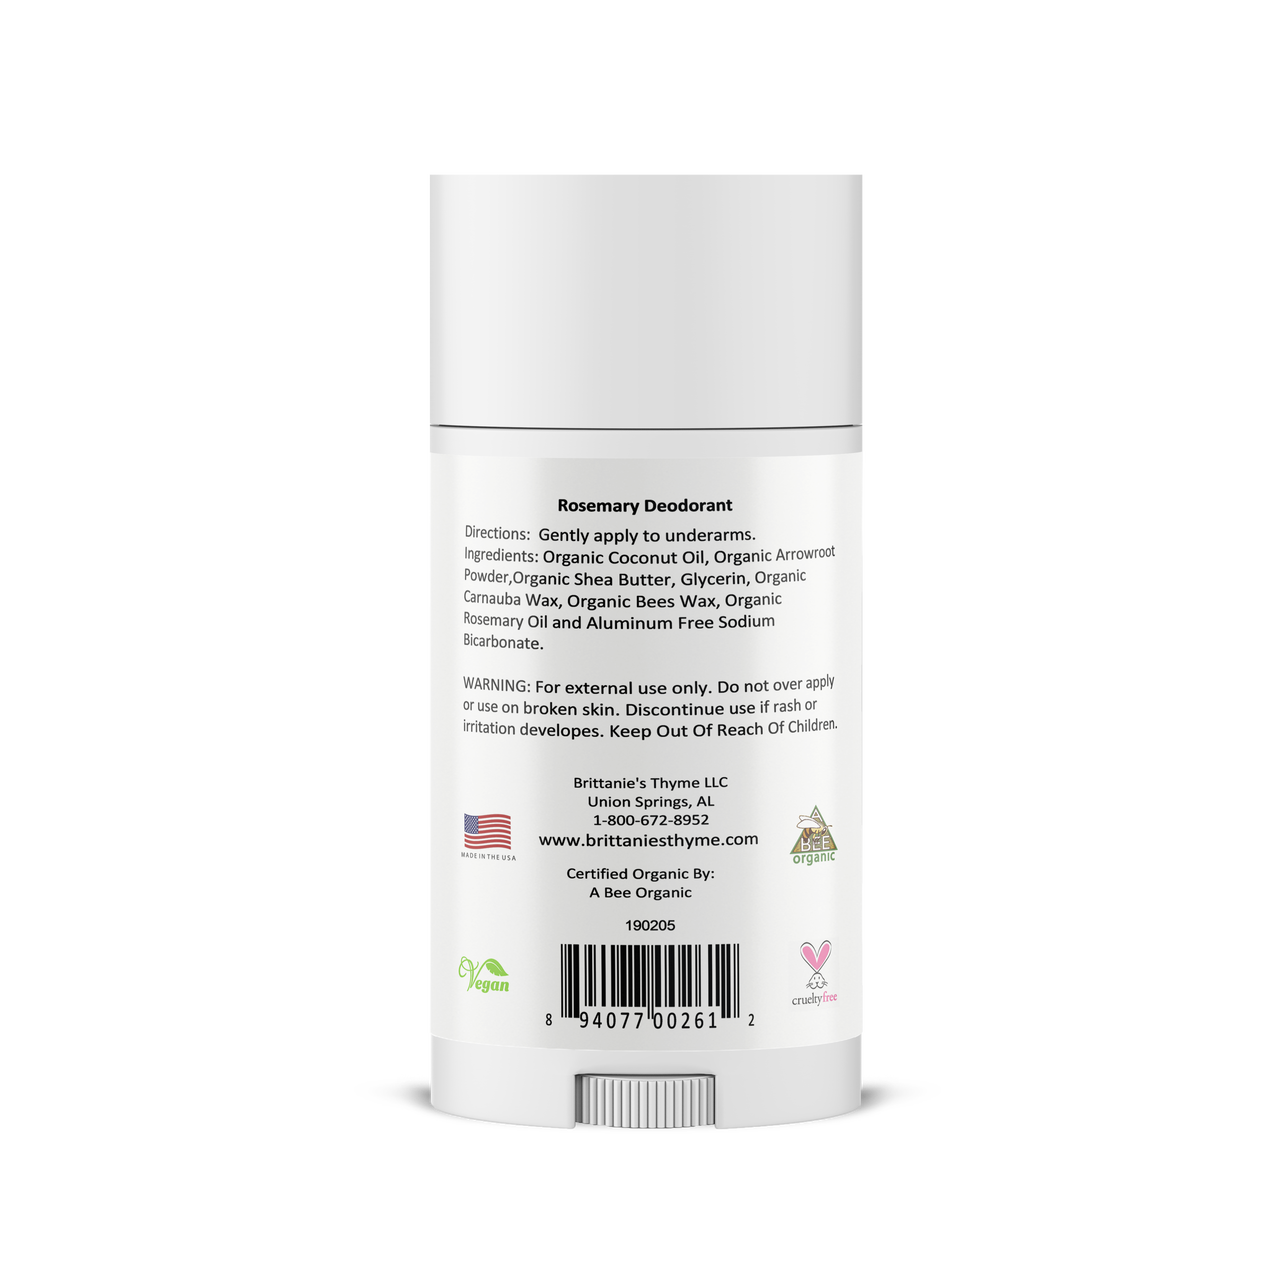 Ingredients: Organic Coconut Oil, Organic Arrowroot Powder,Organic Shea Butter, Glycerin, Organic Carnauba Wax, Organic Bees Wax, Organic Rosemary Oil and Aluminum Free Sodium Bicarbonate.